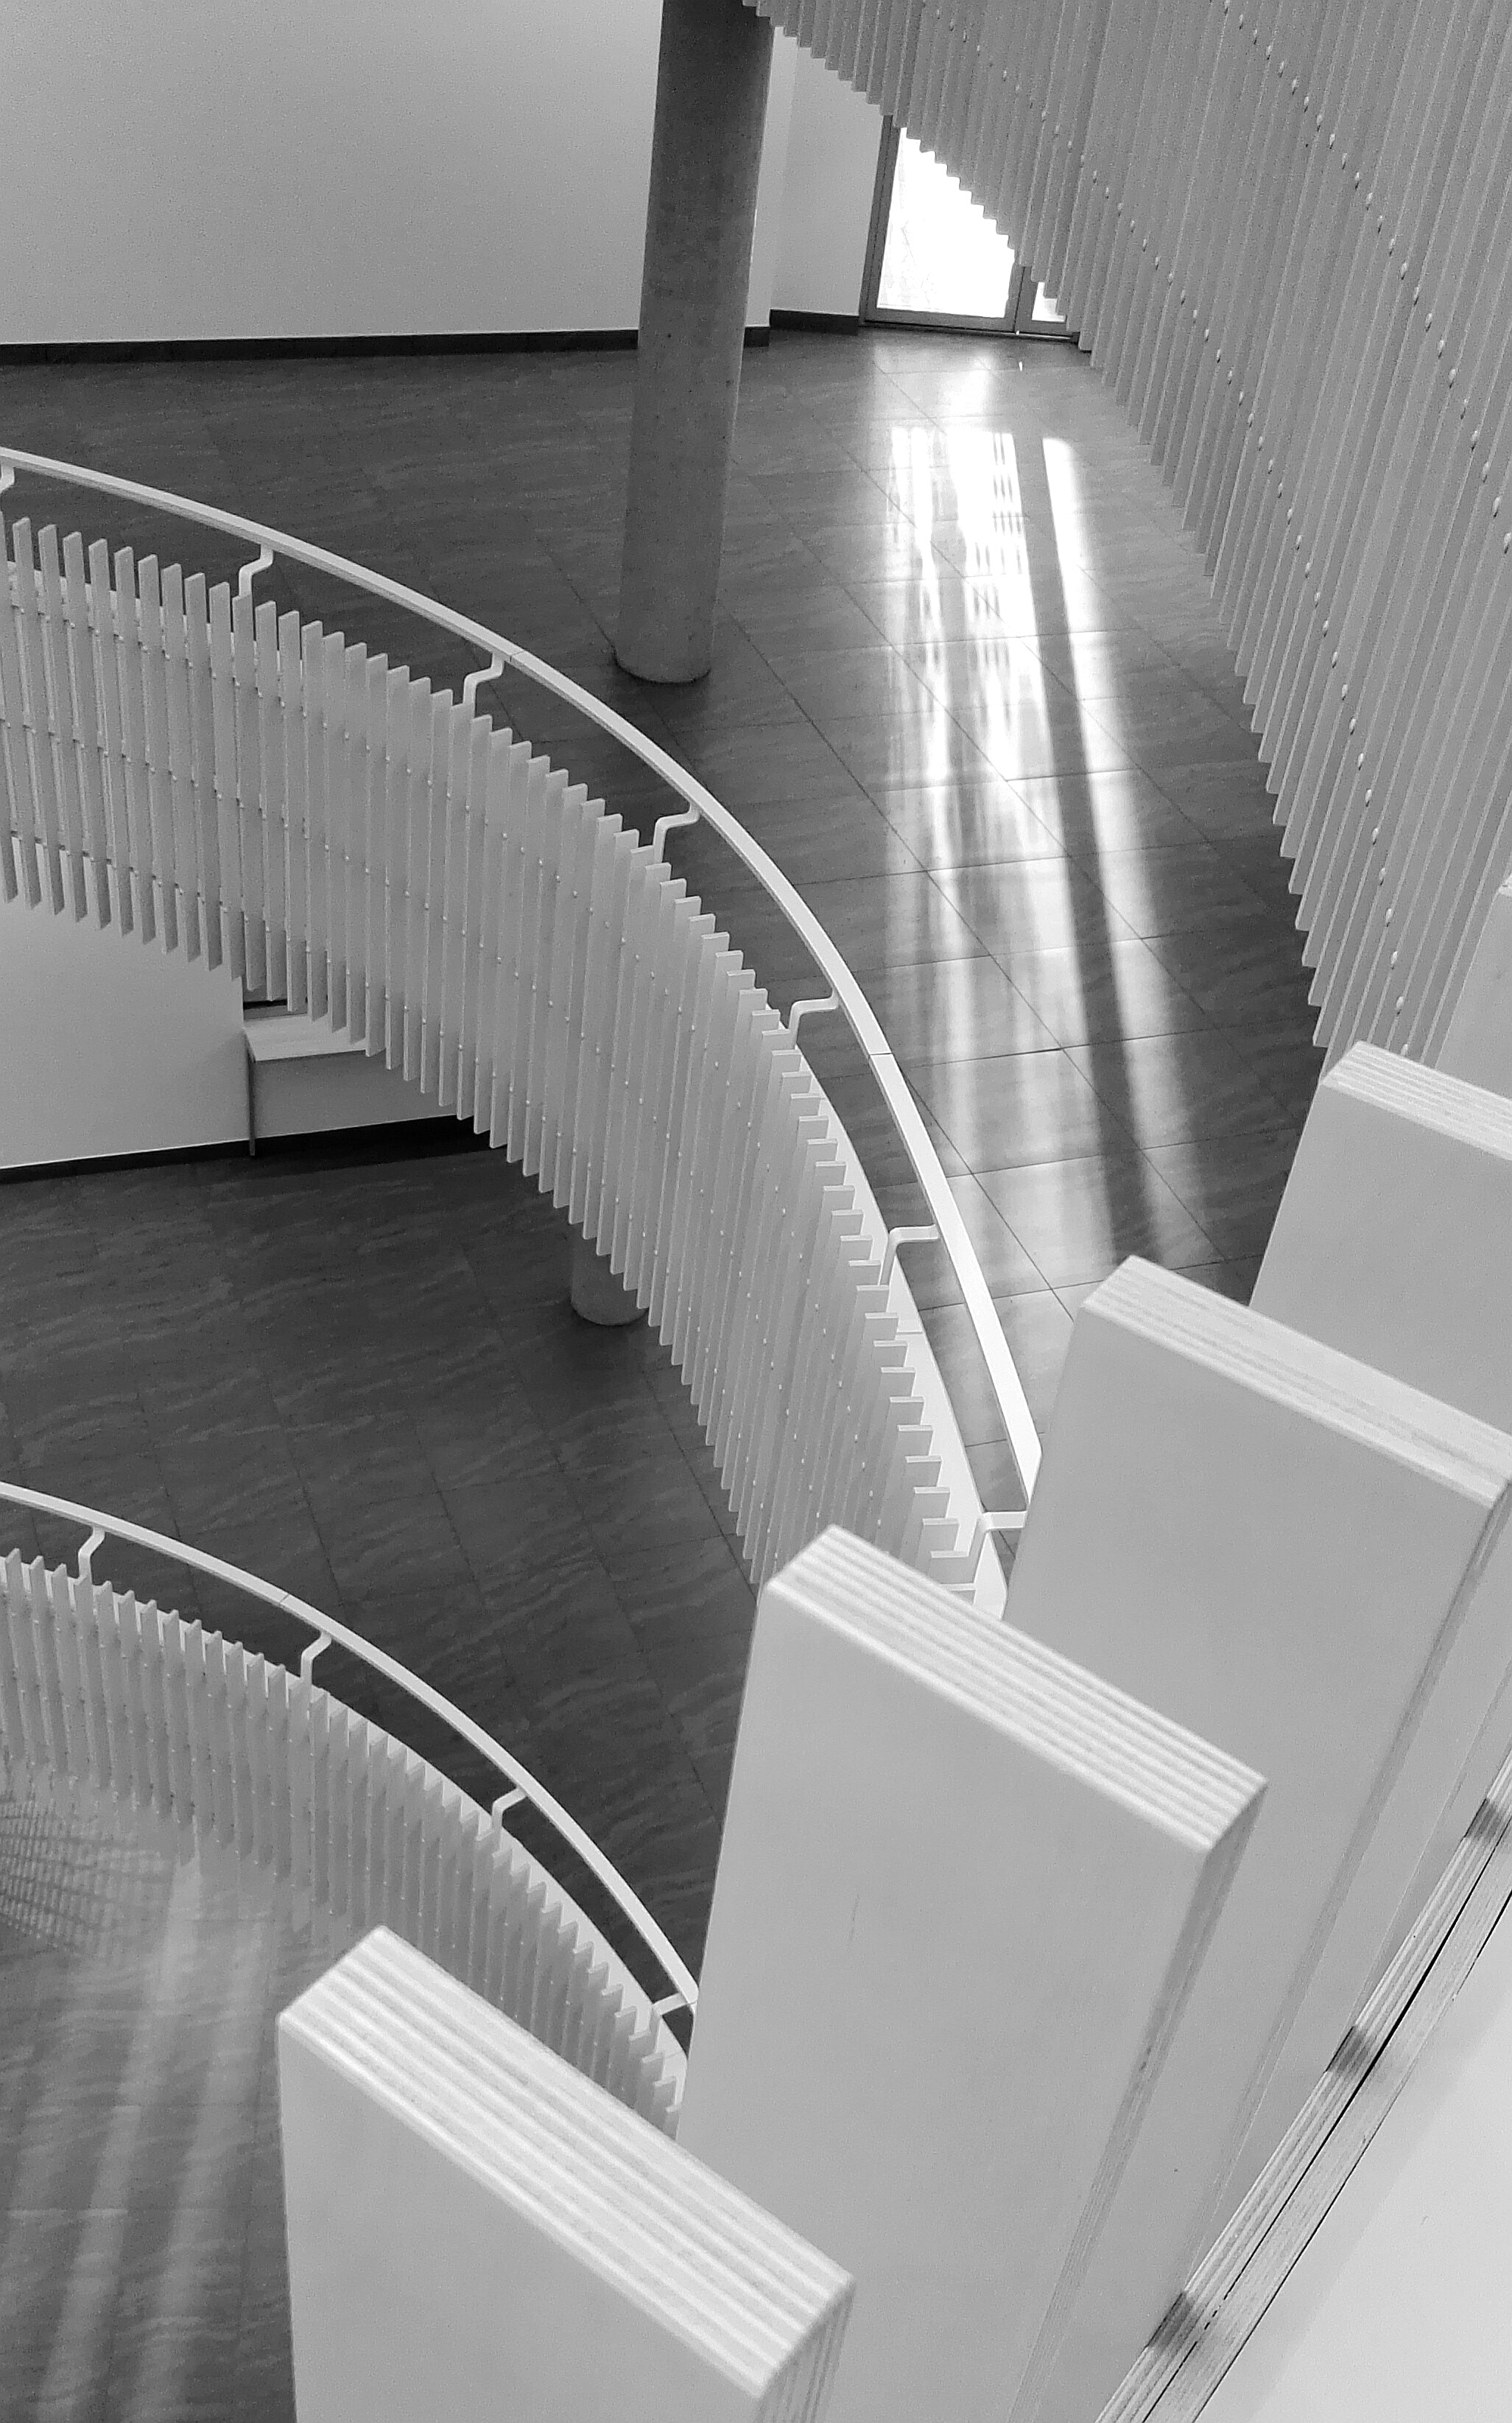 White Steel Rails, Architecture, Black and white, Building, Contemporary, HQ Photo